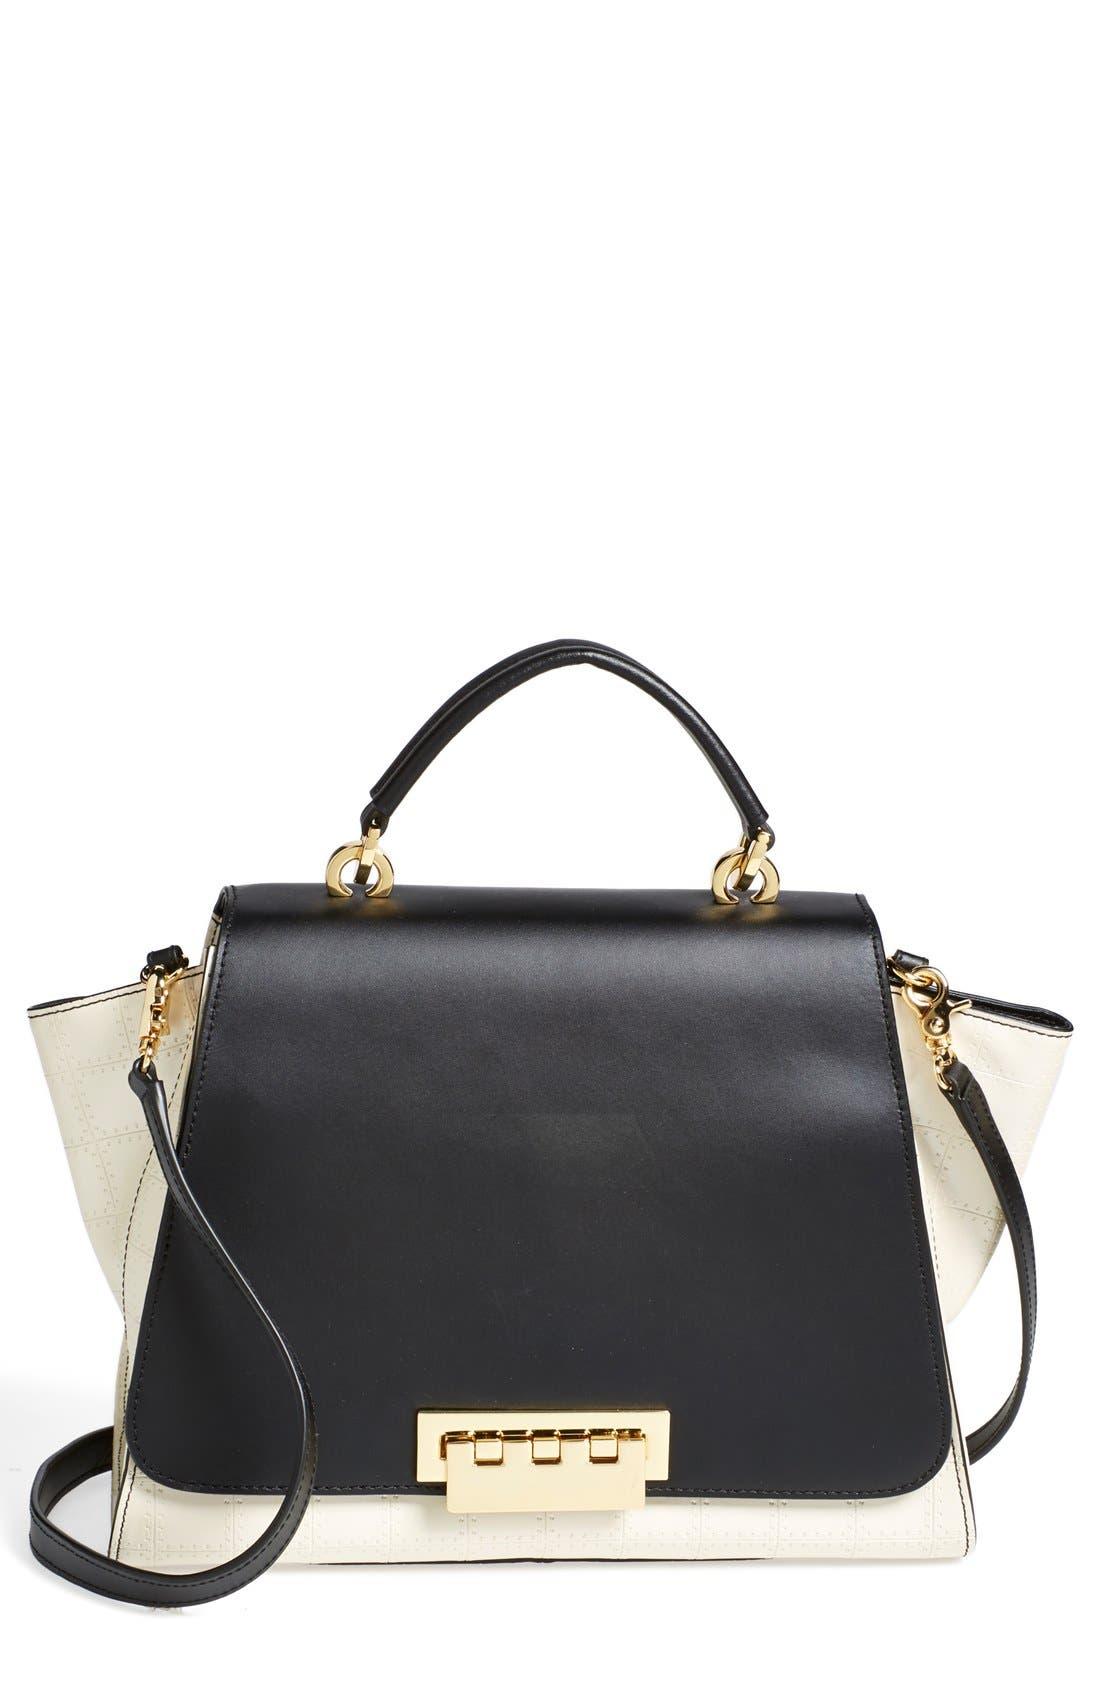 'Eartha' Colorblock Leather Top Handle Satchel,                             Main thumbnail 1, color,                             100